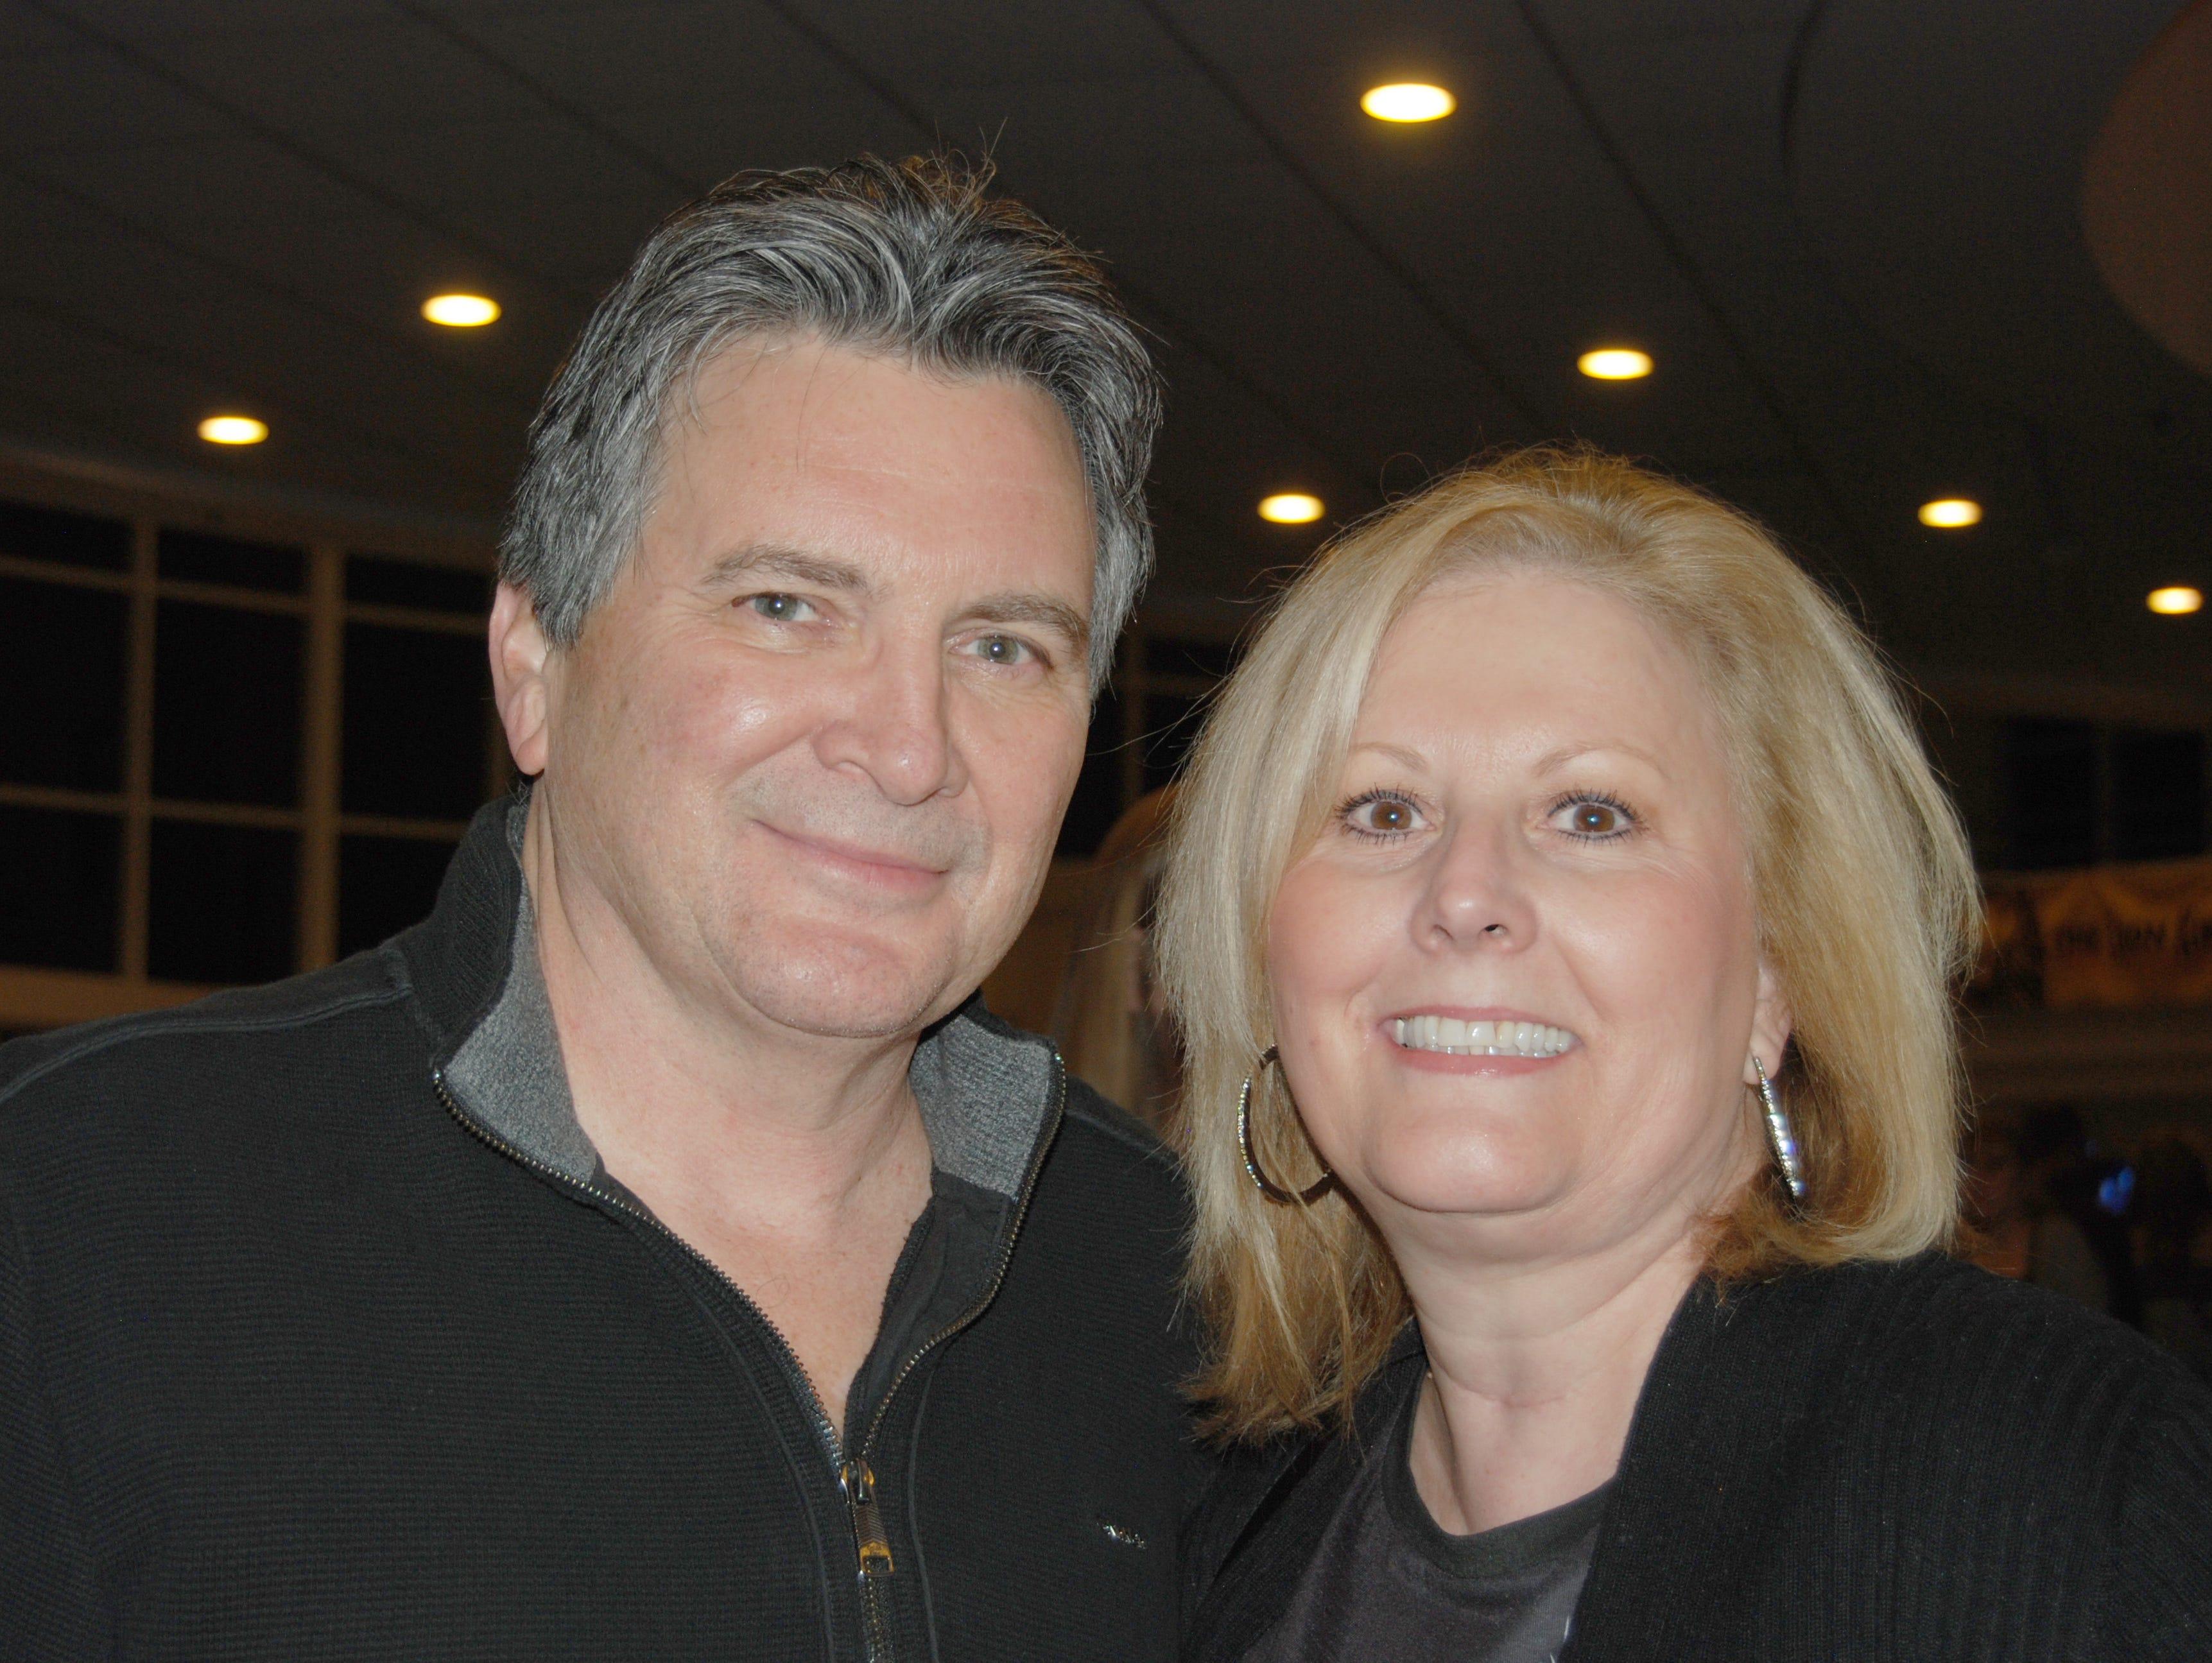 Steve and Susan Smith